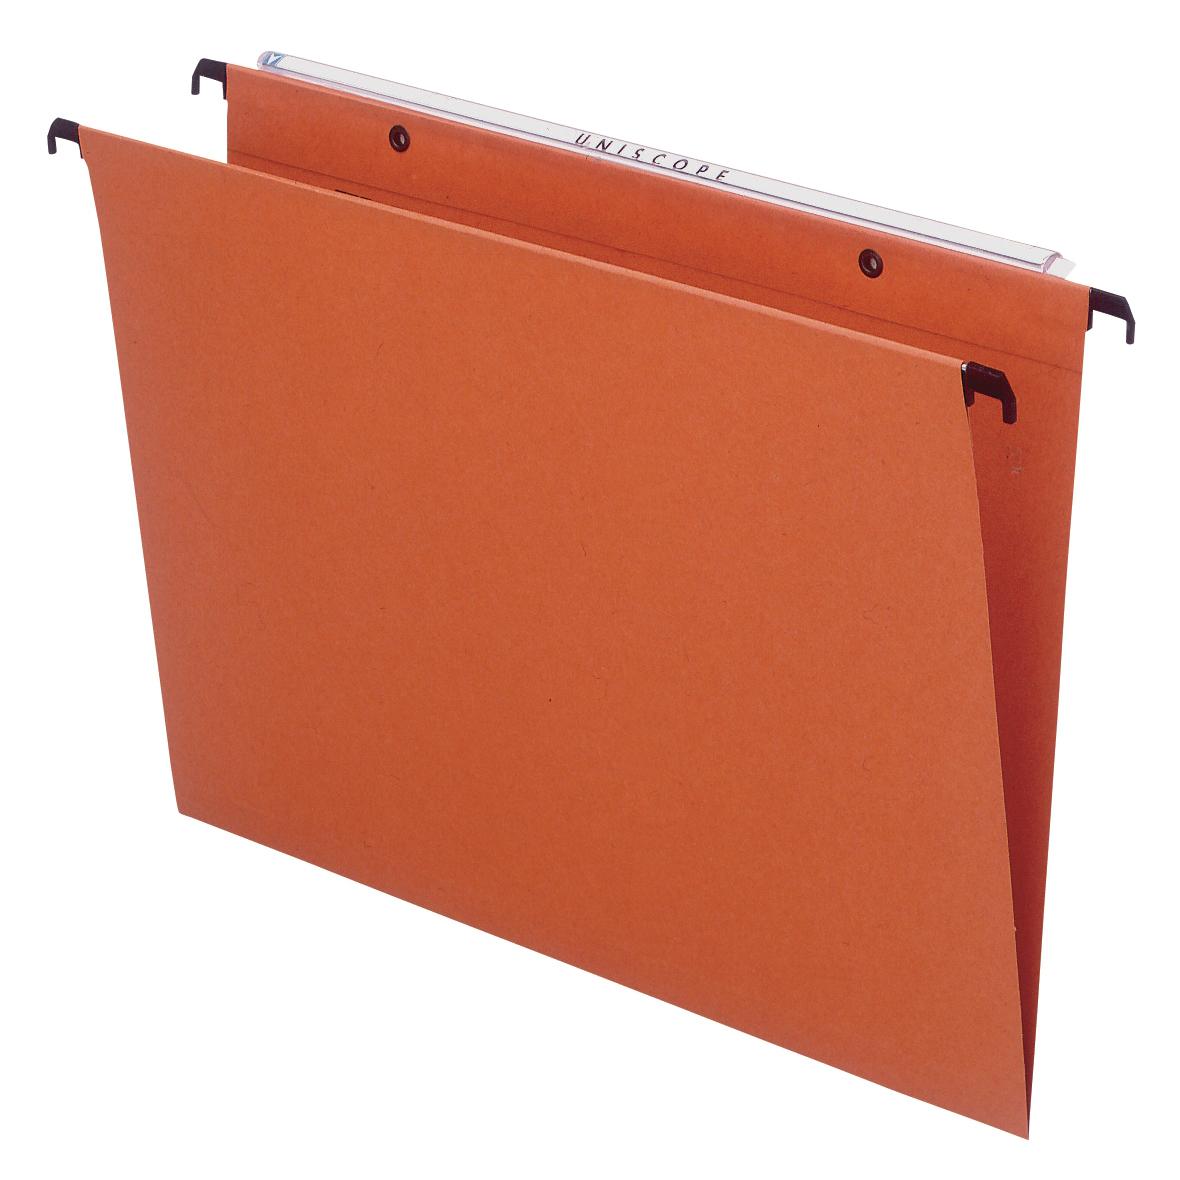 Bantex Linking Suspension File Manilla 30mm Wide-base 220gsm Foolscap Orange Ref 100330687 [Pack 25]